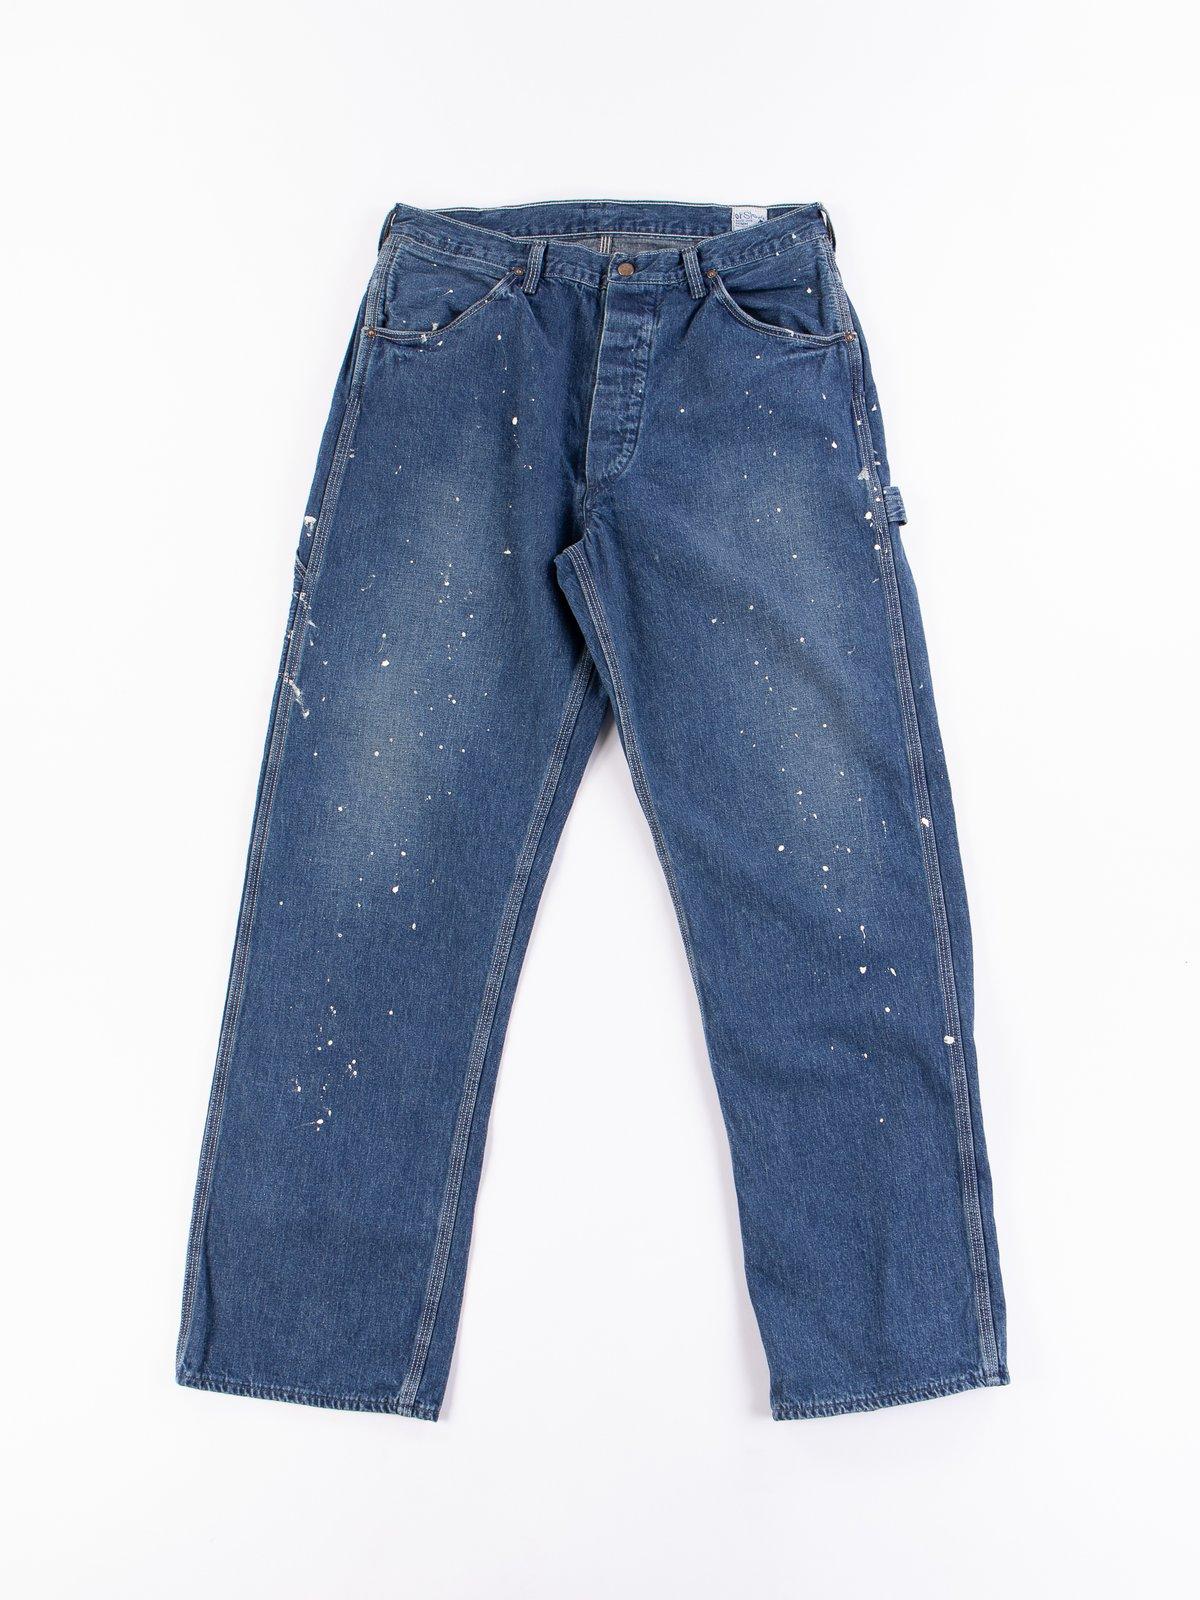 Used Wash Denim Painter Pant - Image 1